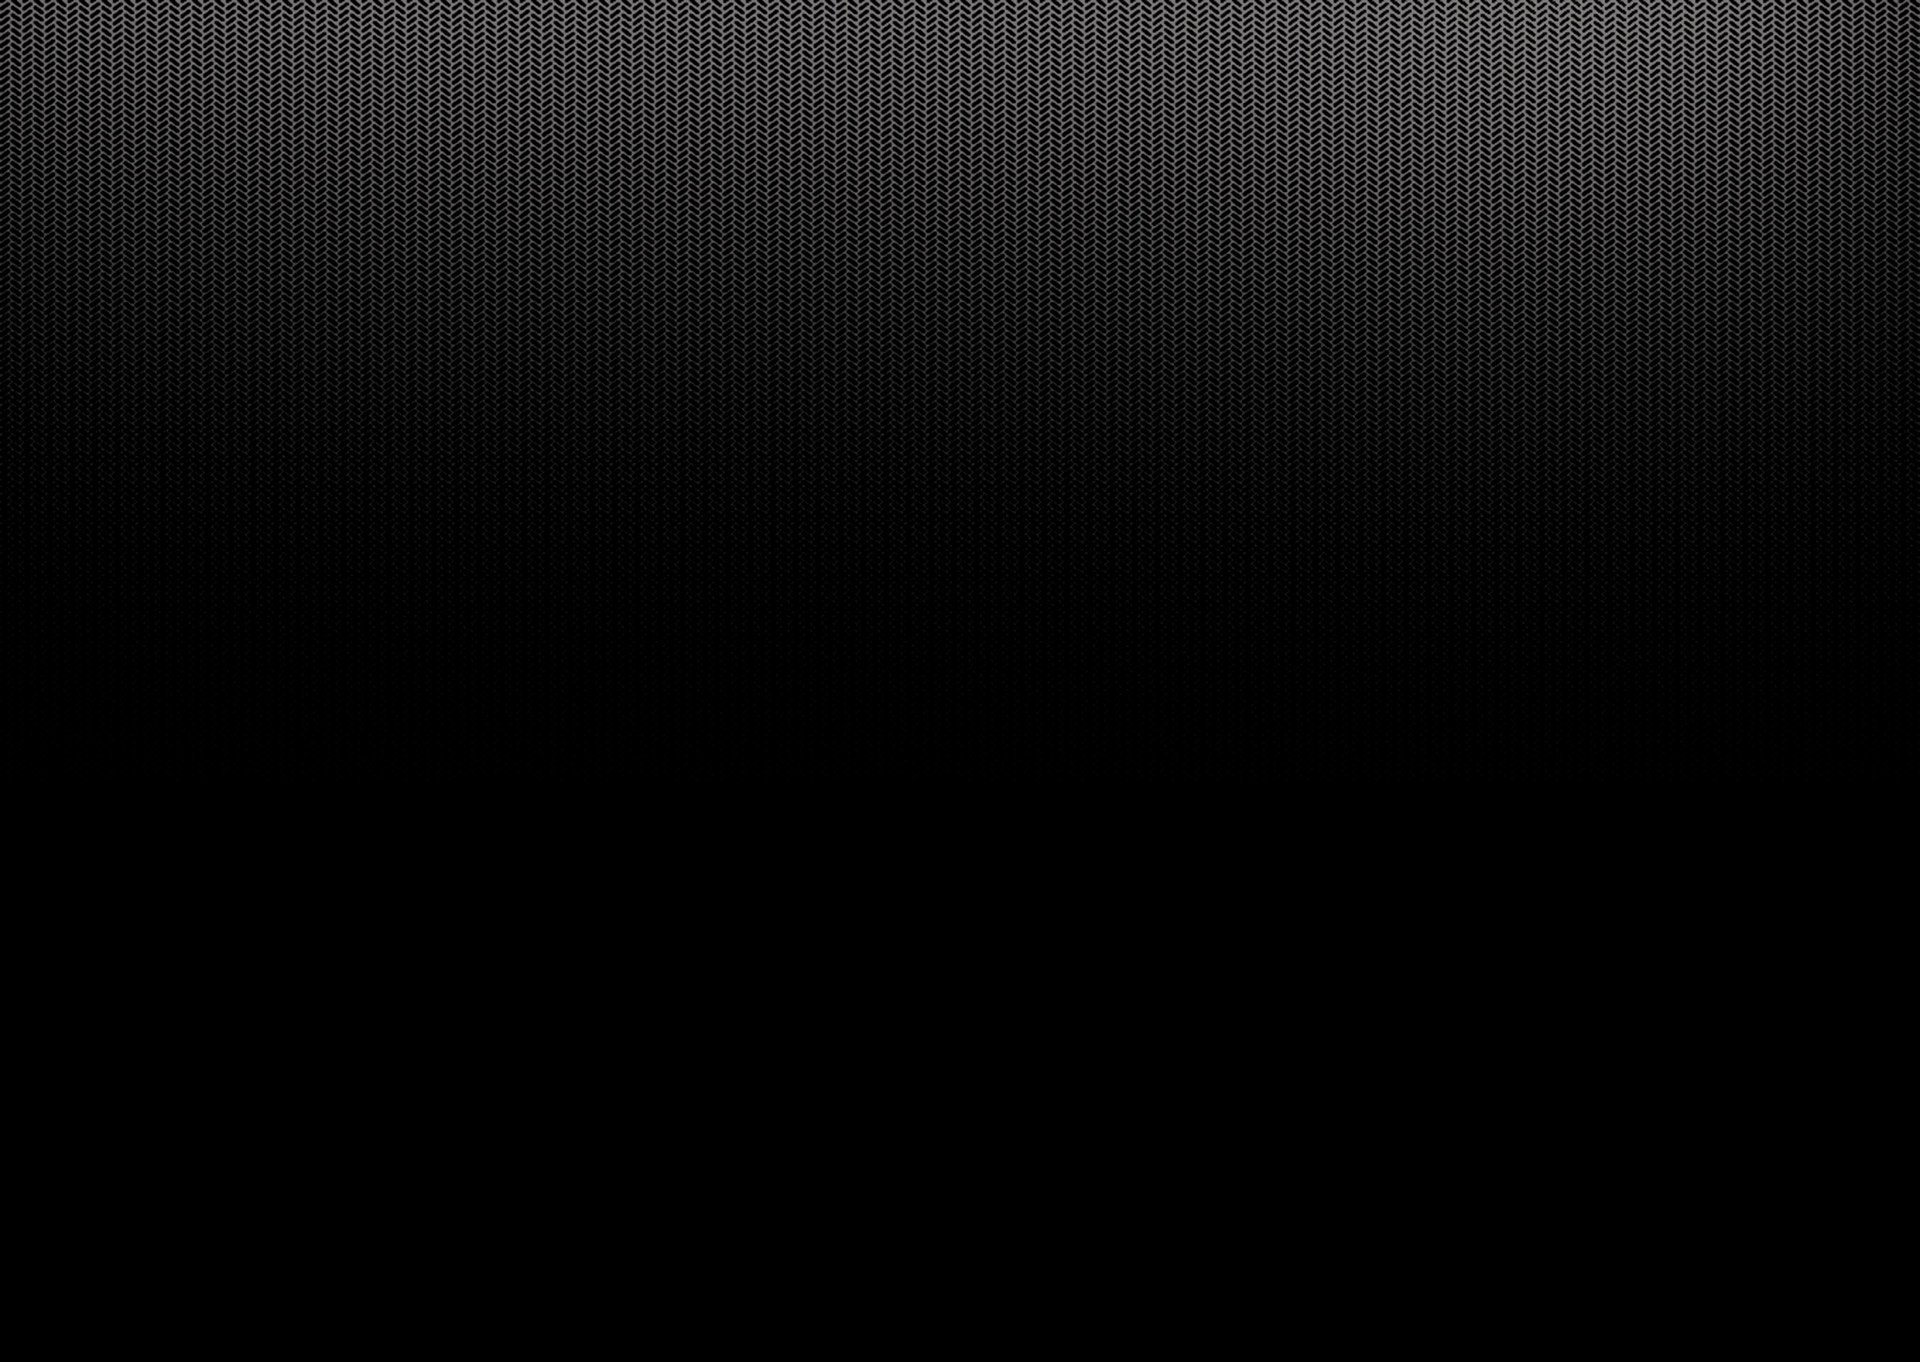 Black Cool Background  WallpaperSafari